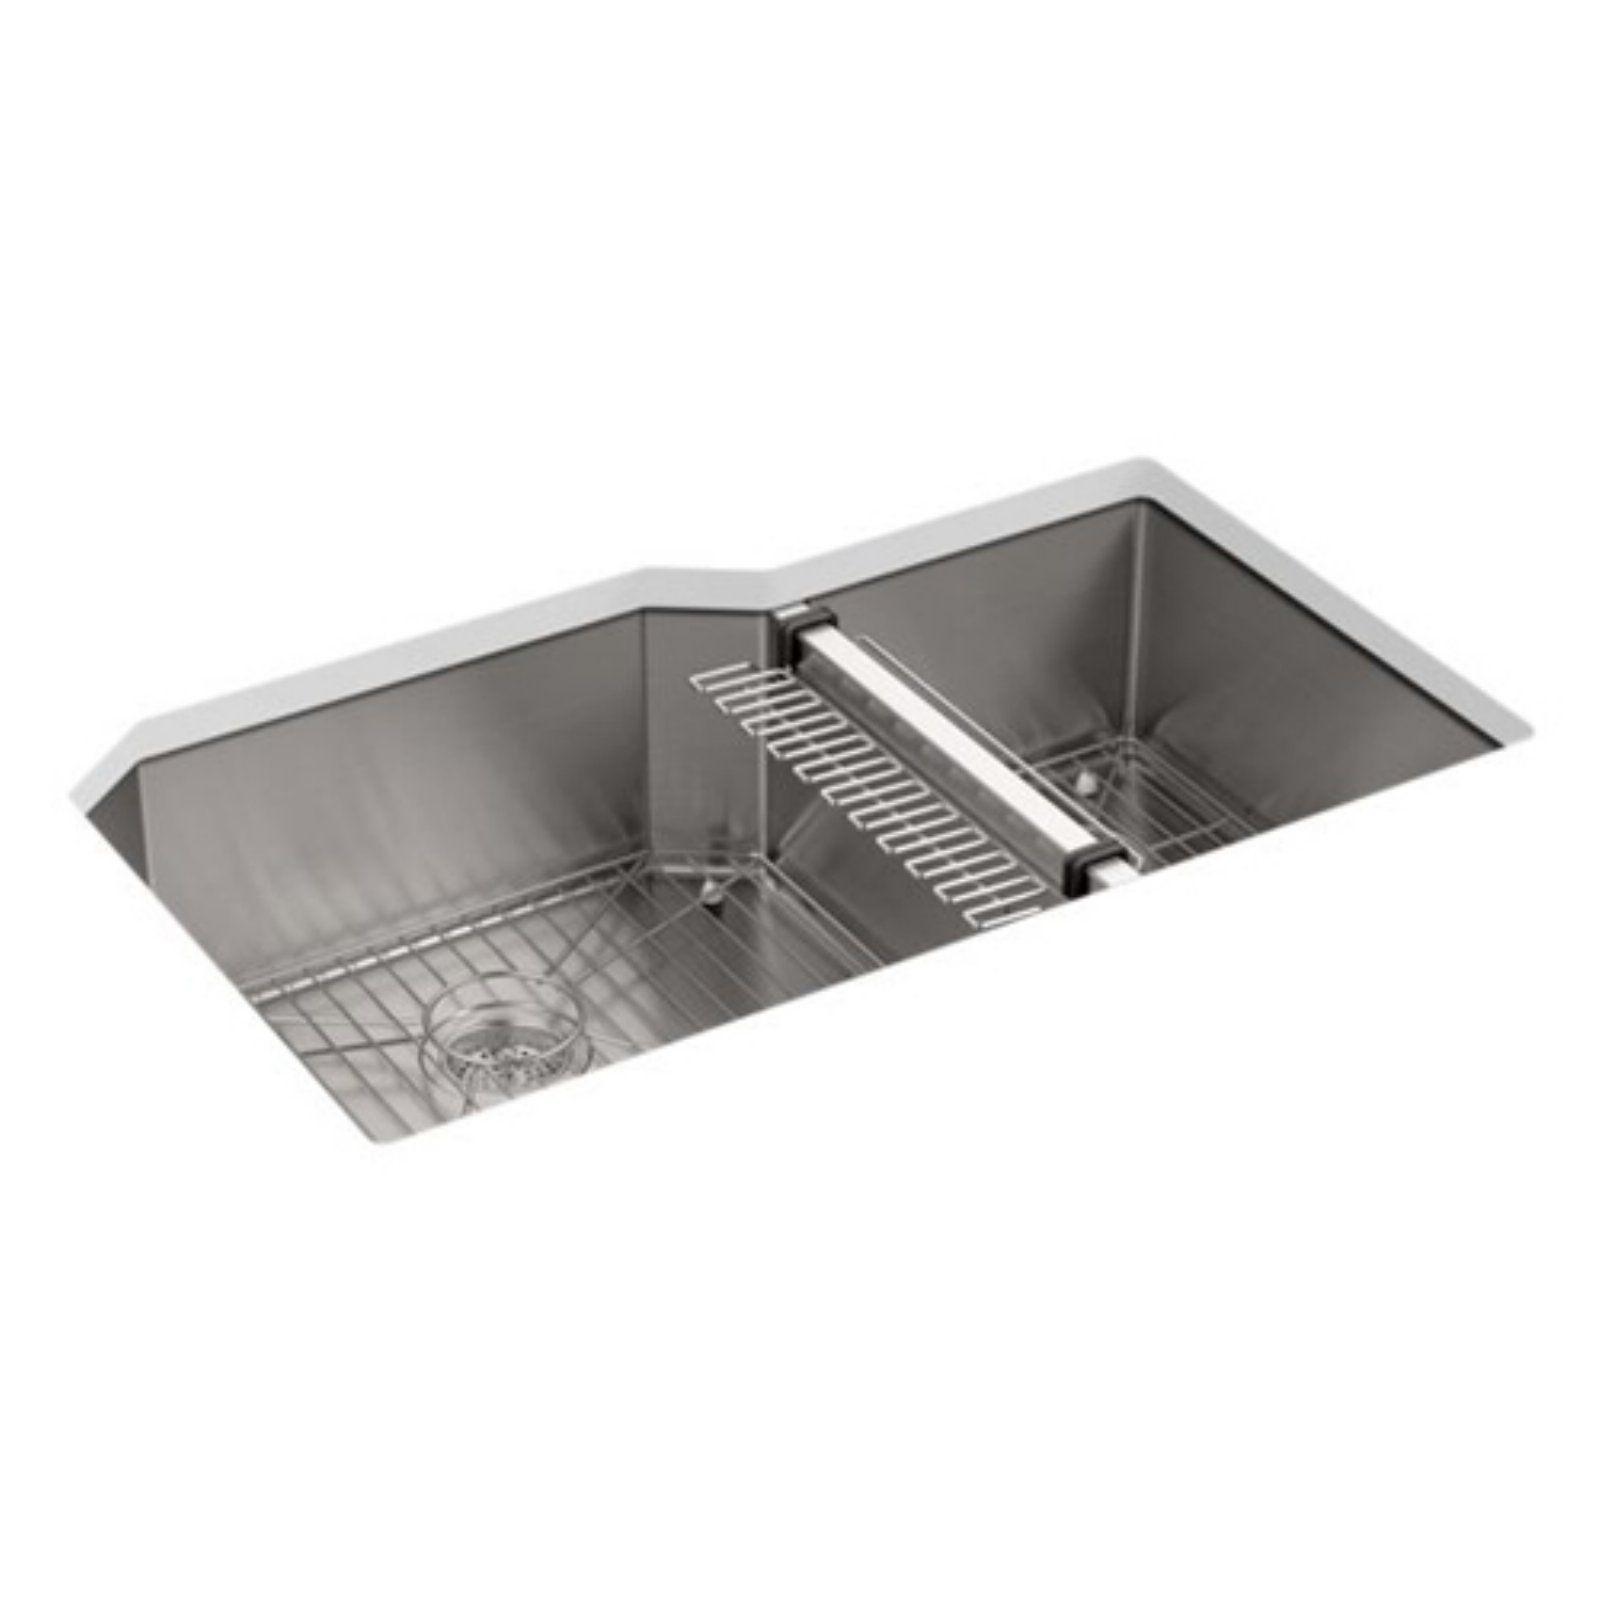 Kohler Strive K5282 Double Basin Undermount Kitchen Sink With Sink